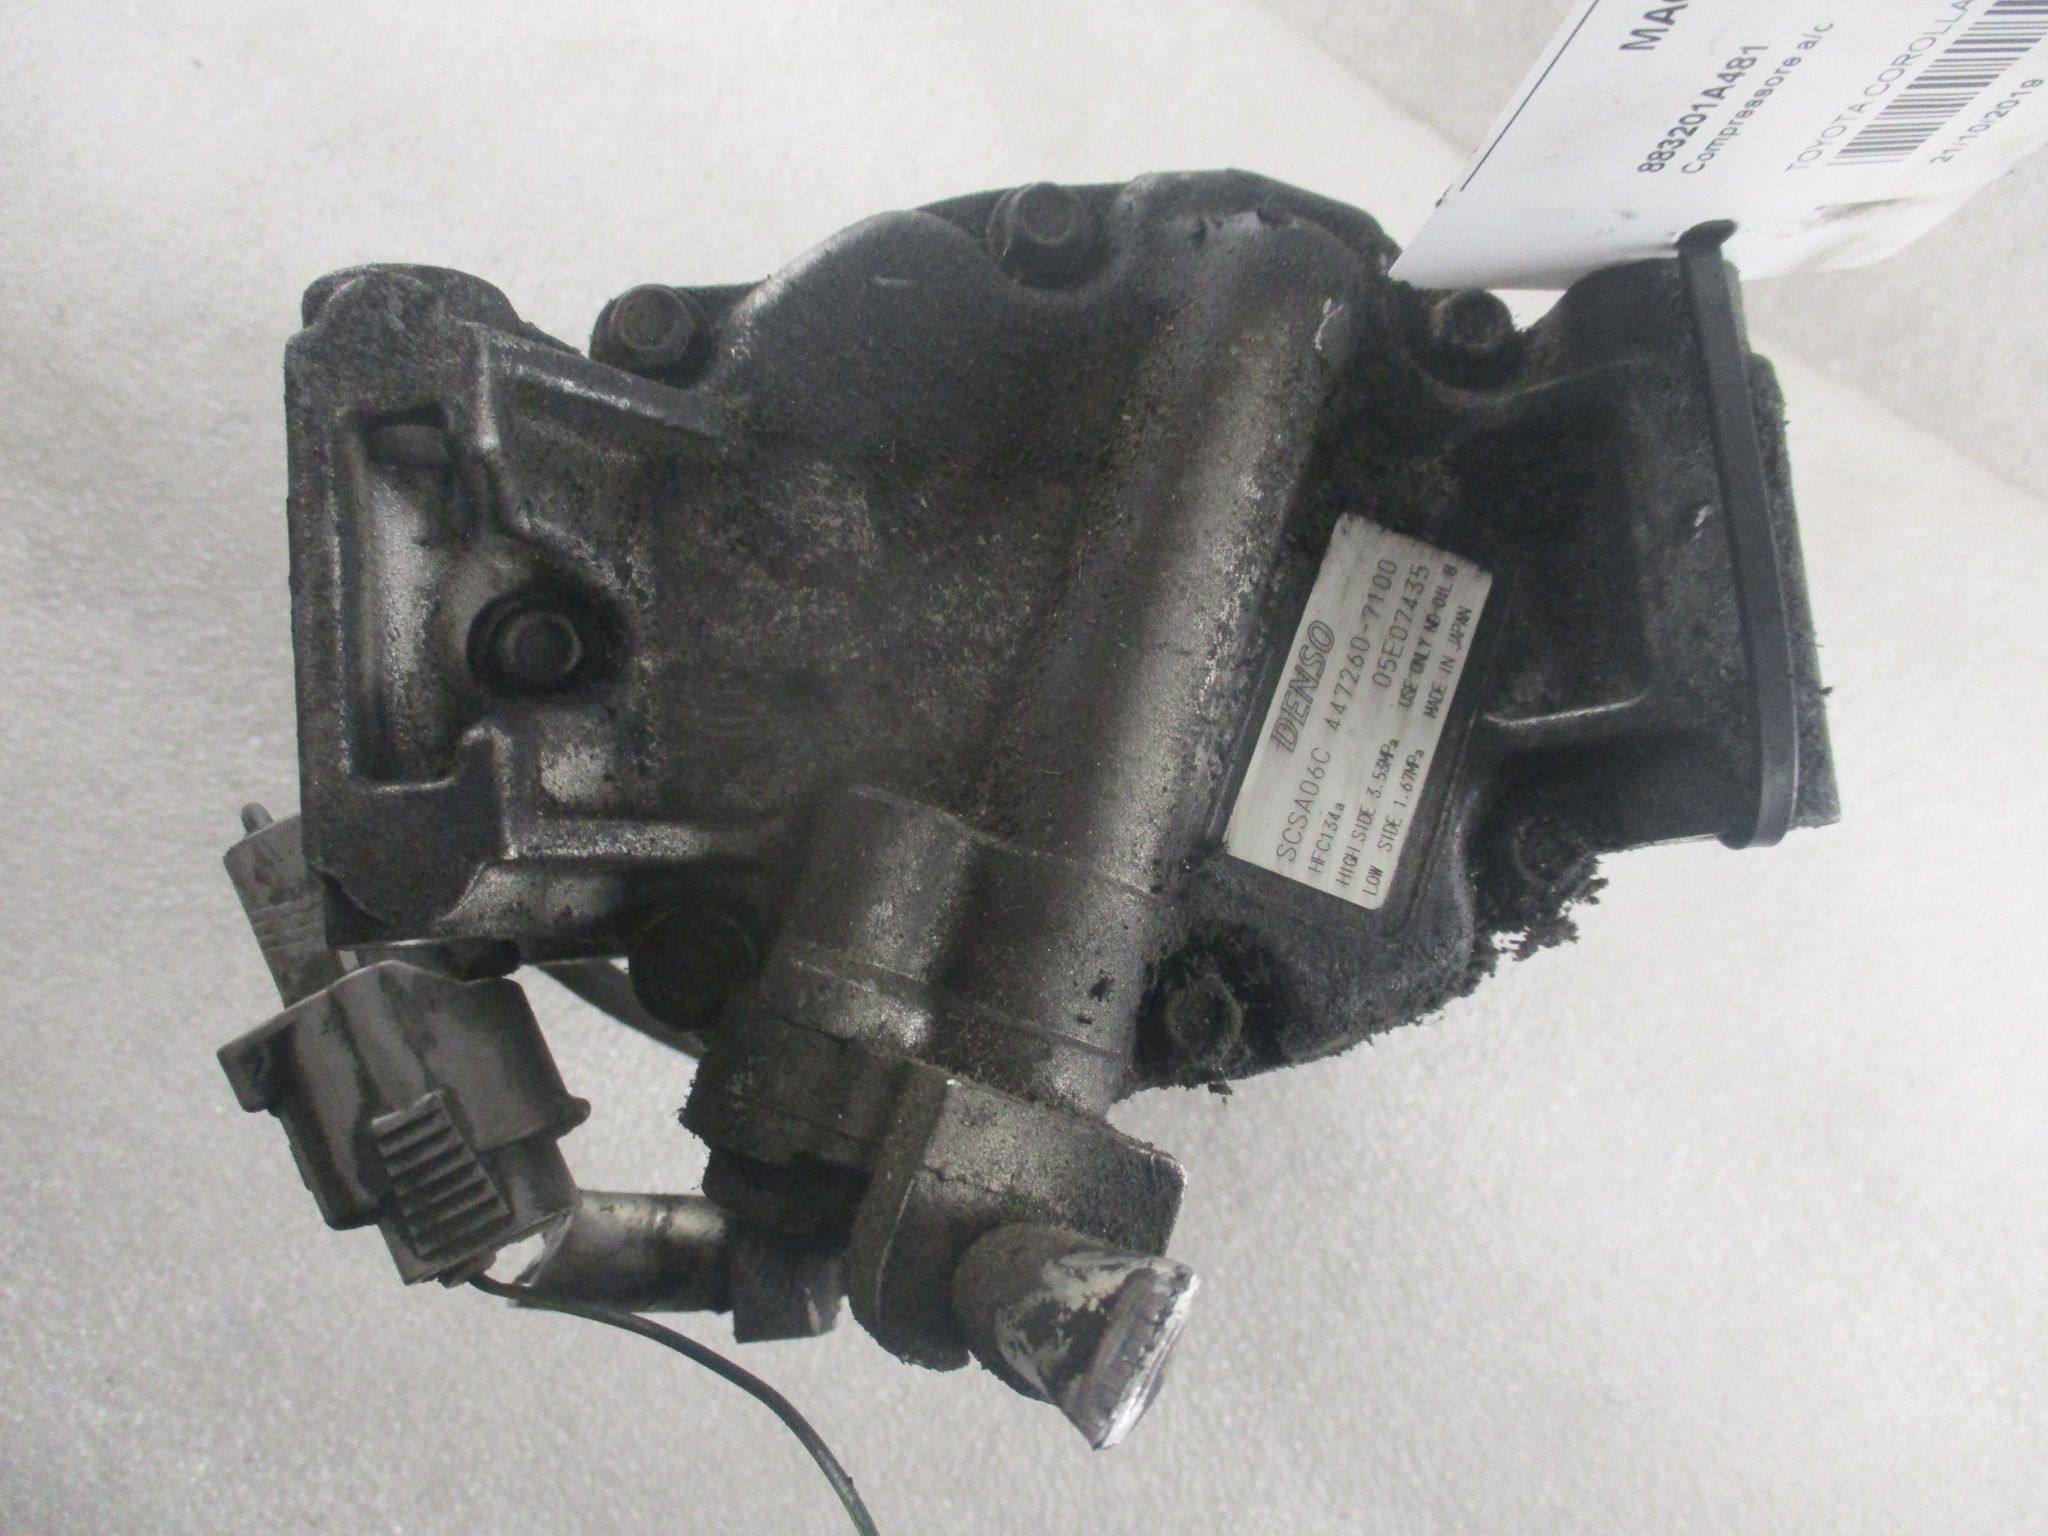 1CDFTV 2.0 D-4D 447260-7100 COMPRESSORE A/C TOYOTA Corolla Berlina 3° Serie 3-5P 1995 Diesel 1CDFTV 66 Kw  (2003) RICAMBI USATI